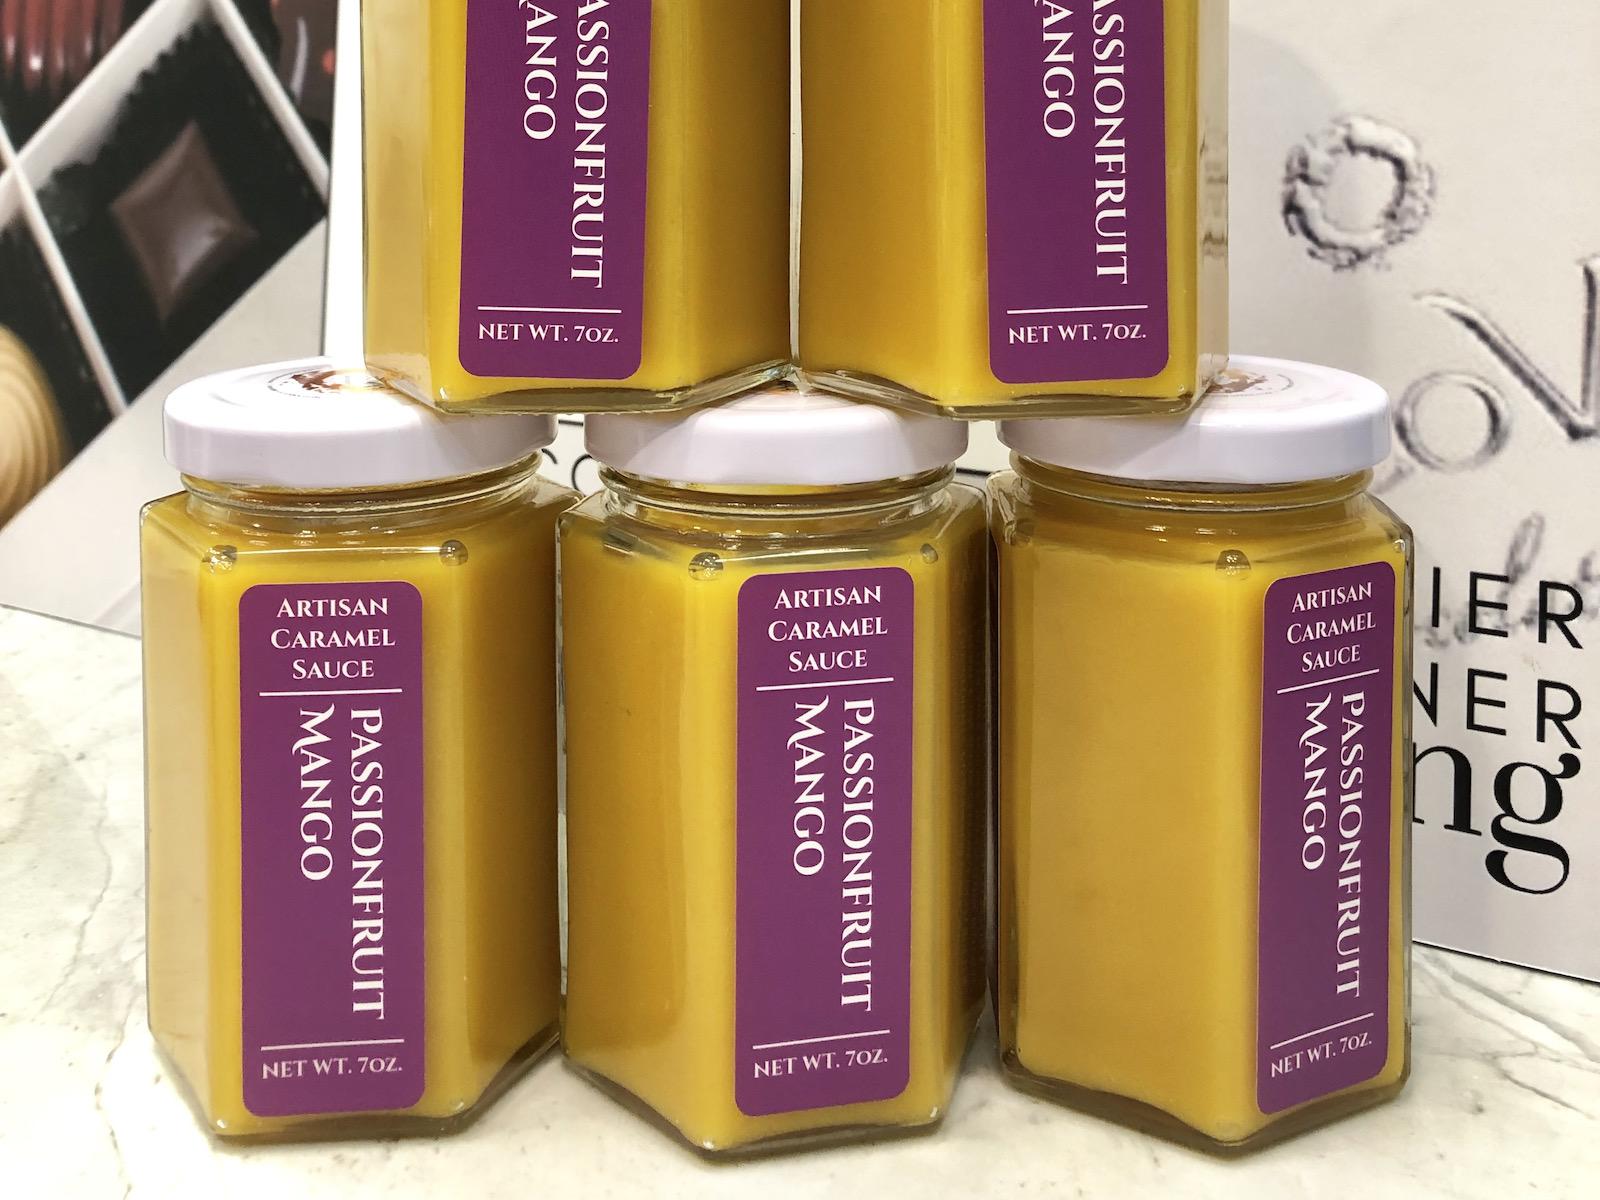 CocoVaa Passionfruit Mango Caramel Sauce